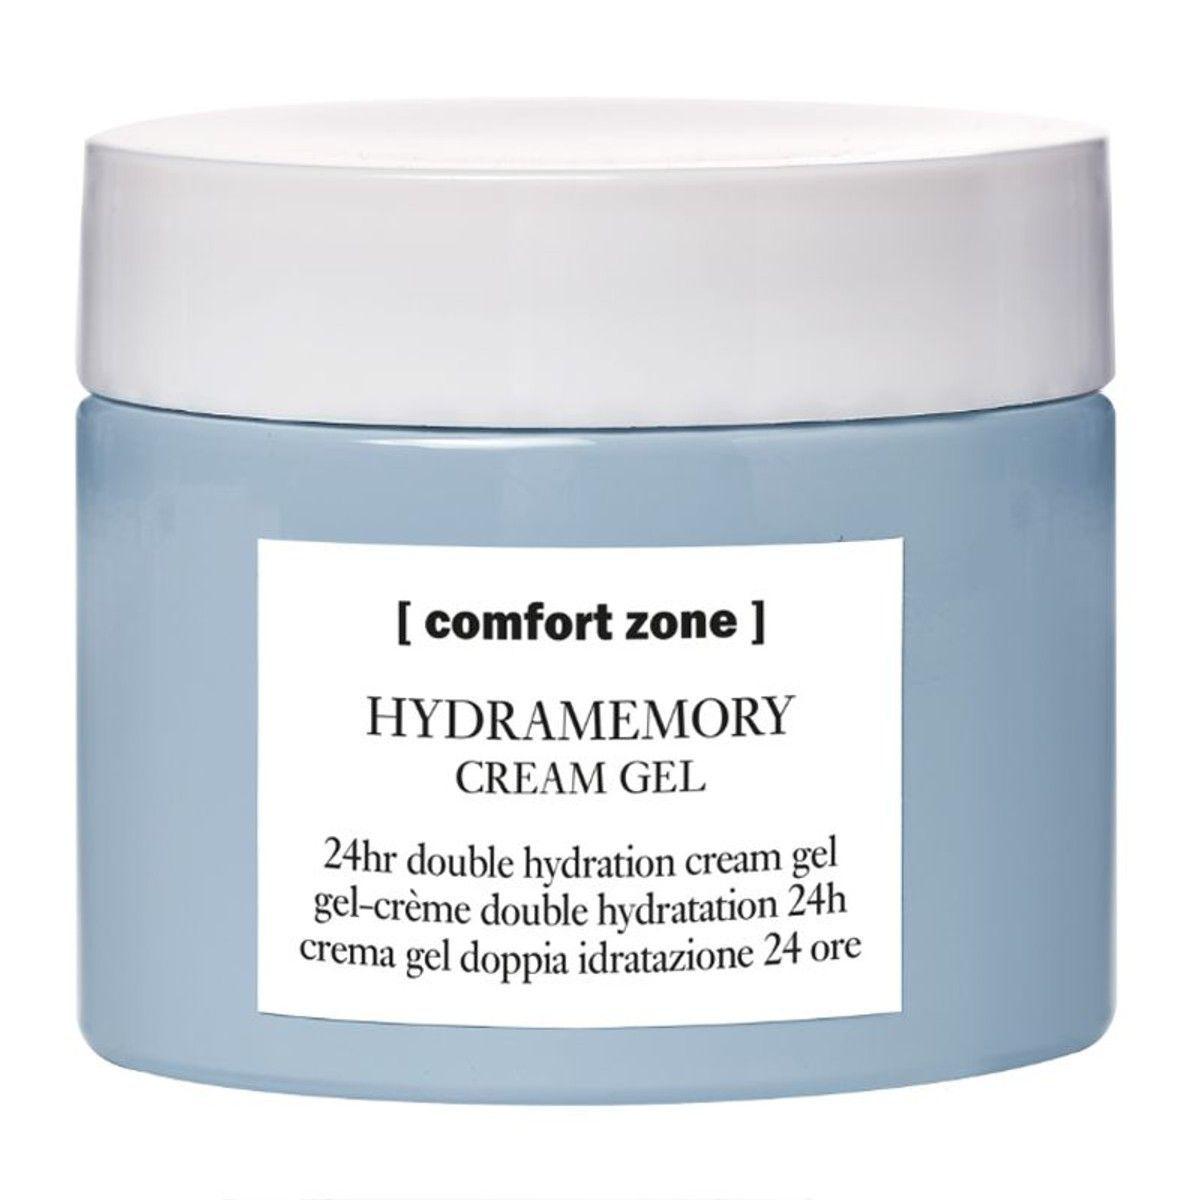 Kem dưỡng Comfort Zone HydraMemory CreamKem dưỡng Comfort Zone HydraMemory Cream